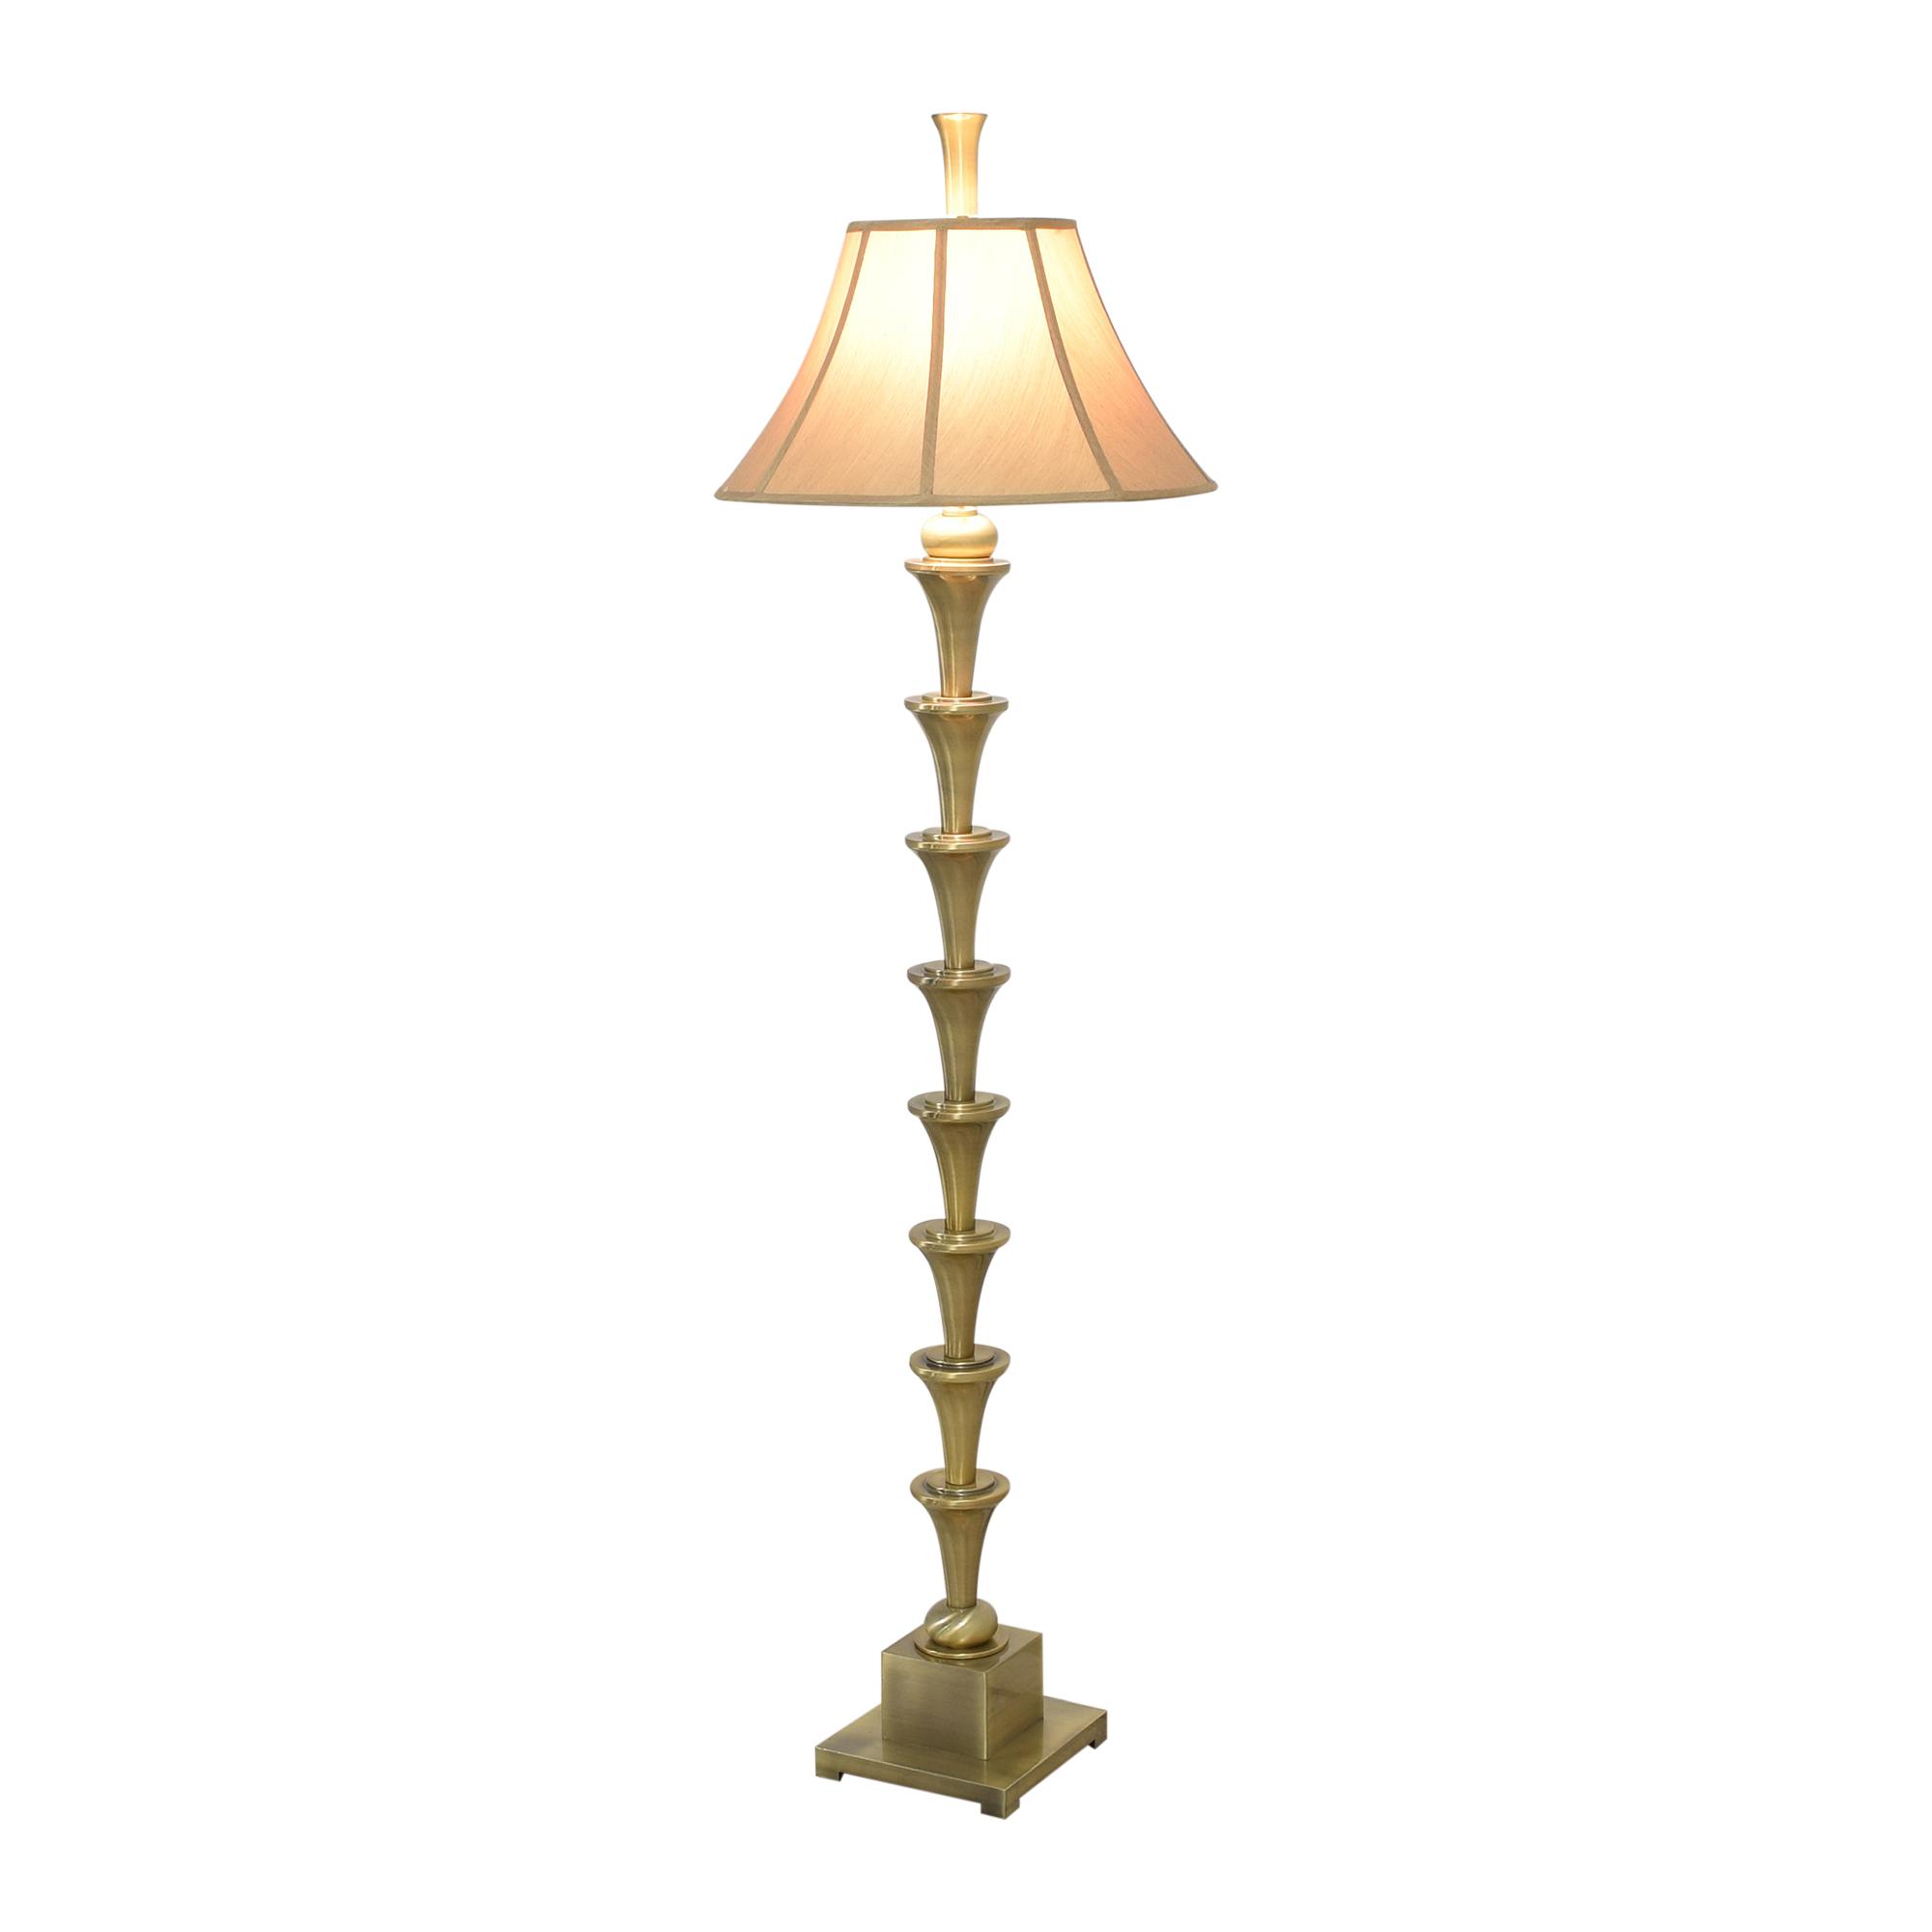 Horchow Decorative Floor Lamp / Decor